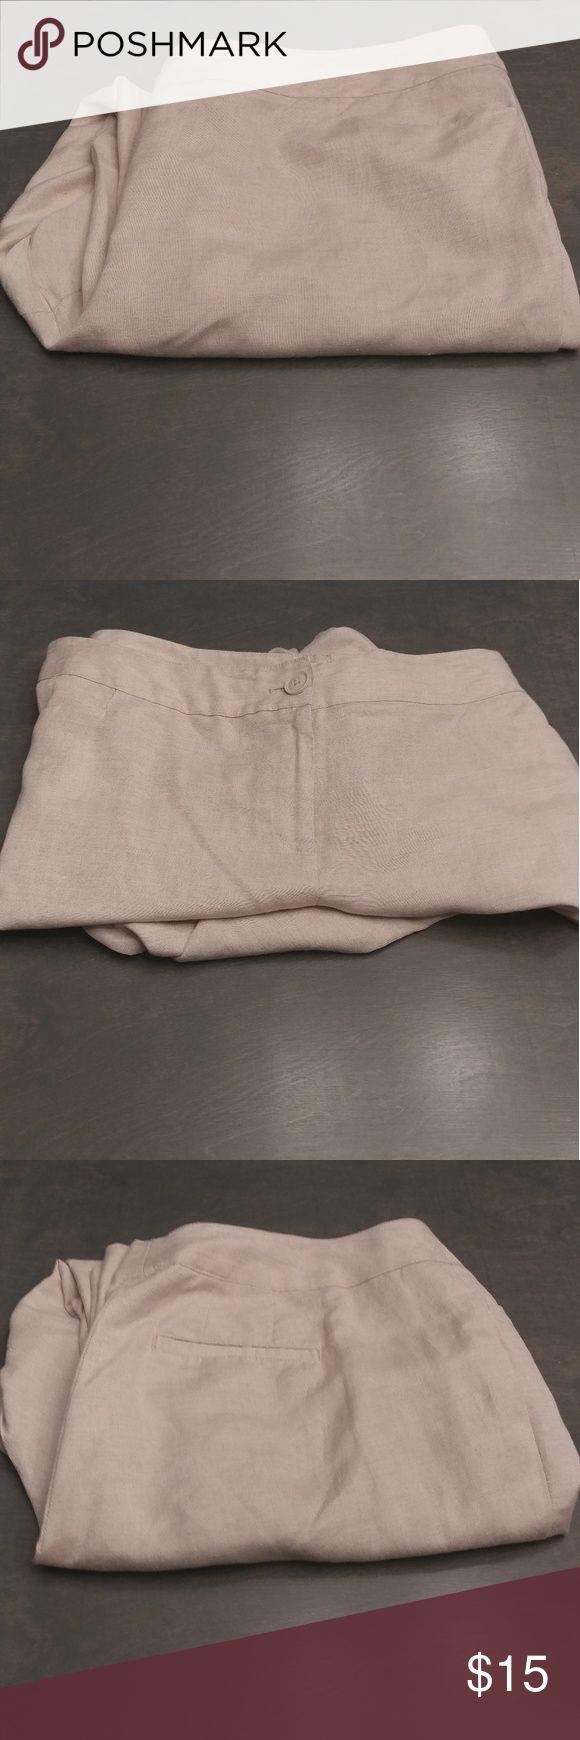 "Lane Bryant Trousers Pants Plus Size 22 Beautiful Off White Cream Pants  44"" Waist 30"" Inseam  Front Pockets  Linen Rayon Bundle and Save Lane Bryant Pants Trousers"